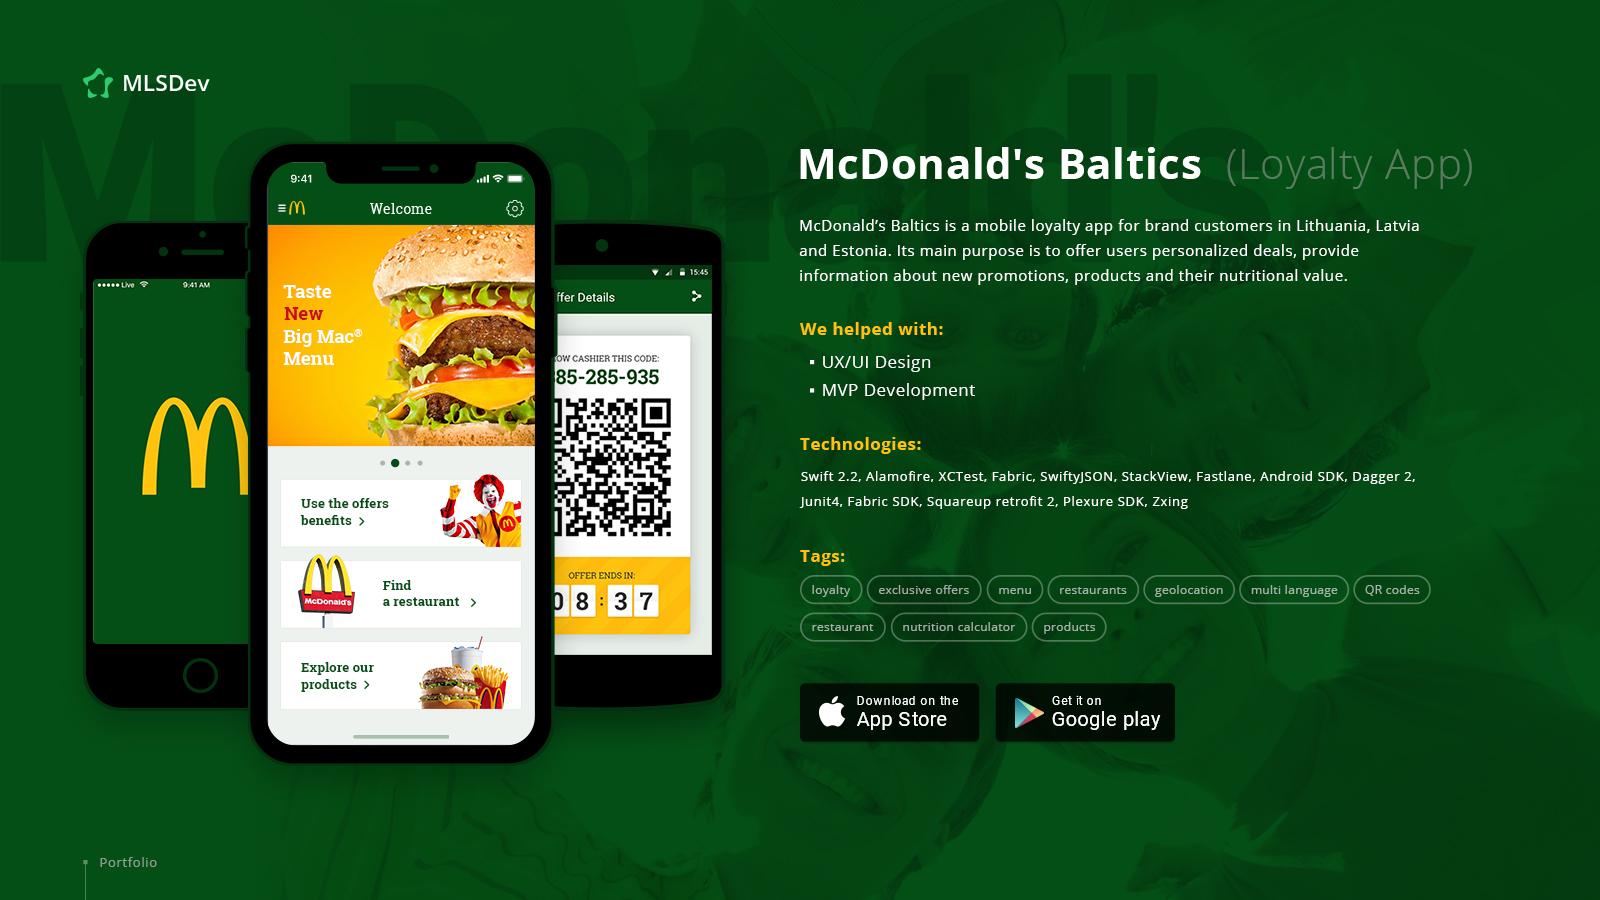 McDonald's Baltics: Loyalty App